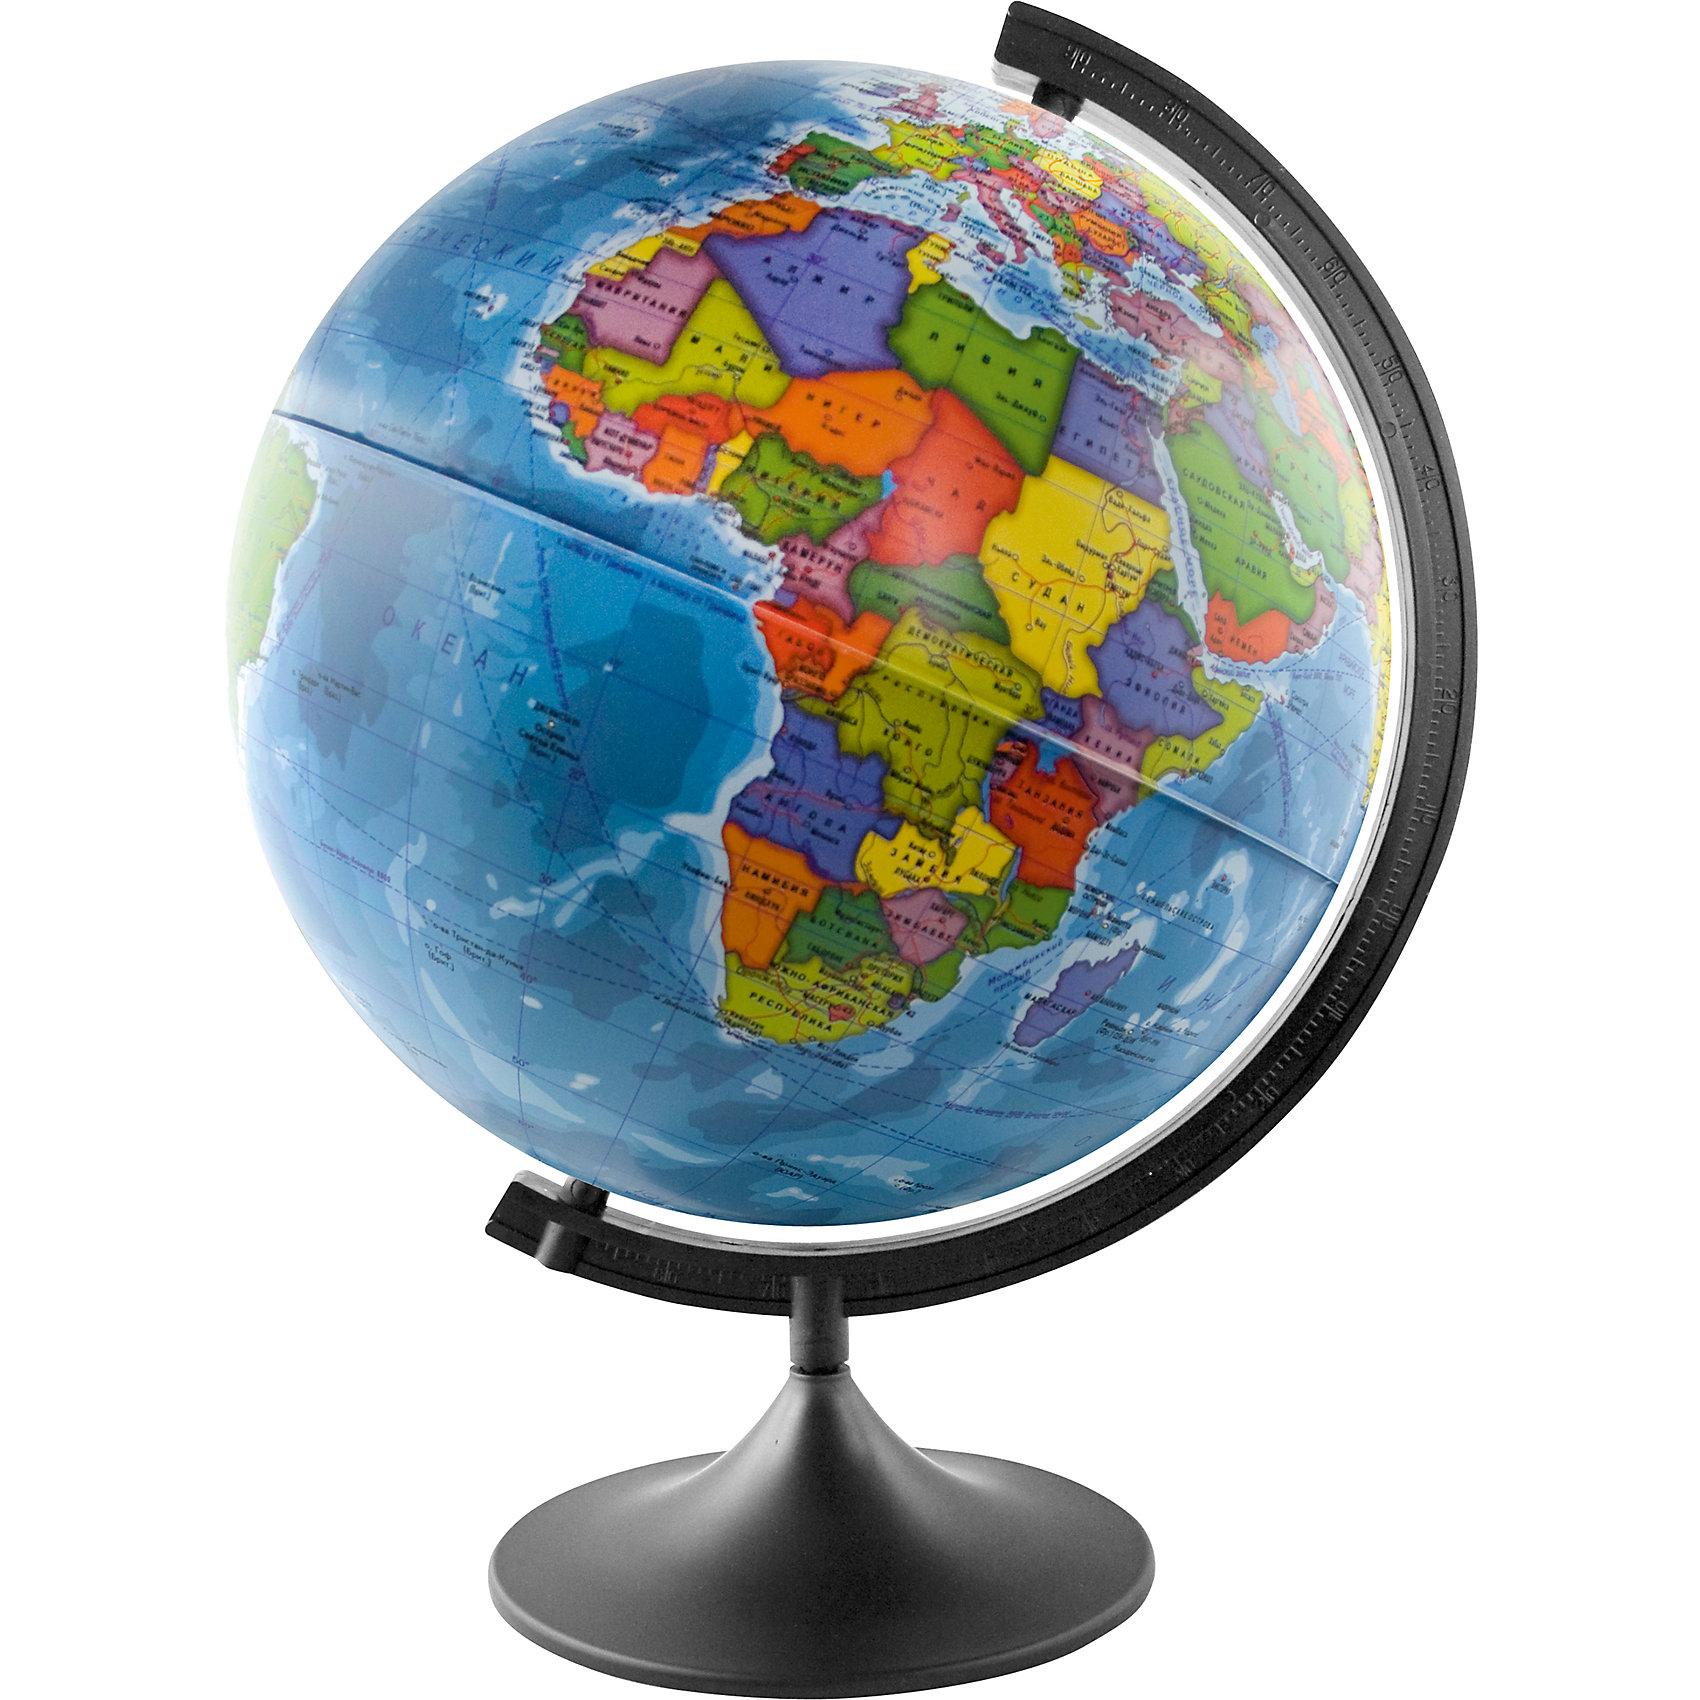 Глобус Земли, политический, диаметр 320Глобусы<br>Глобус Земли д-р 320 политический<br><br>Ширина мм: 410<br>Глубина мм: 320<br>Высота мм: 320<br>Вес г: 250<br>Возраст от месяцев: 36<br>Возраст до месяцев: 2147483647<br>Пол: Унисекс<br>Возраст: Детский<br>SKU: 4801665